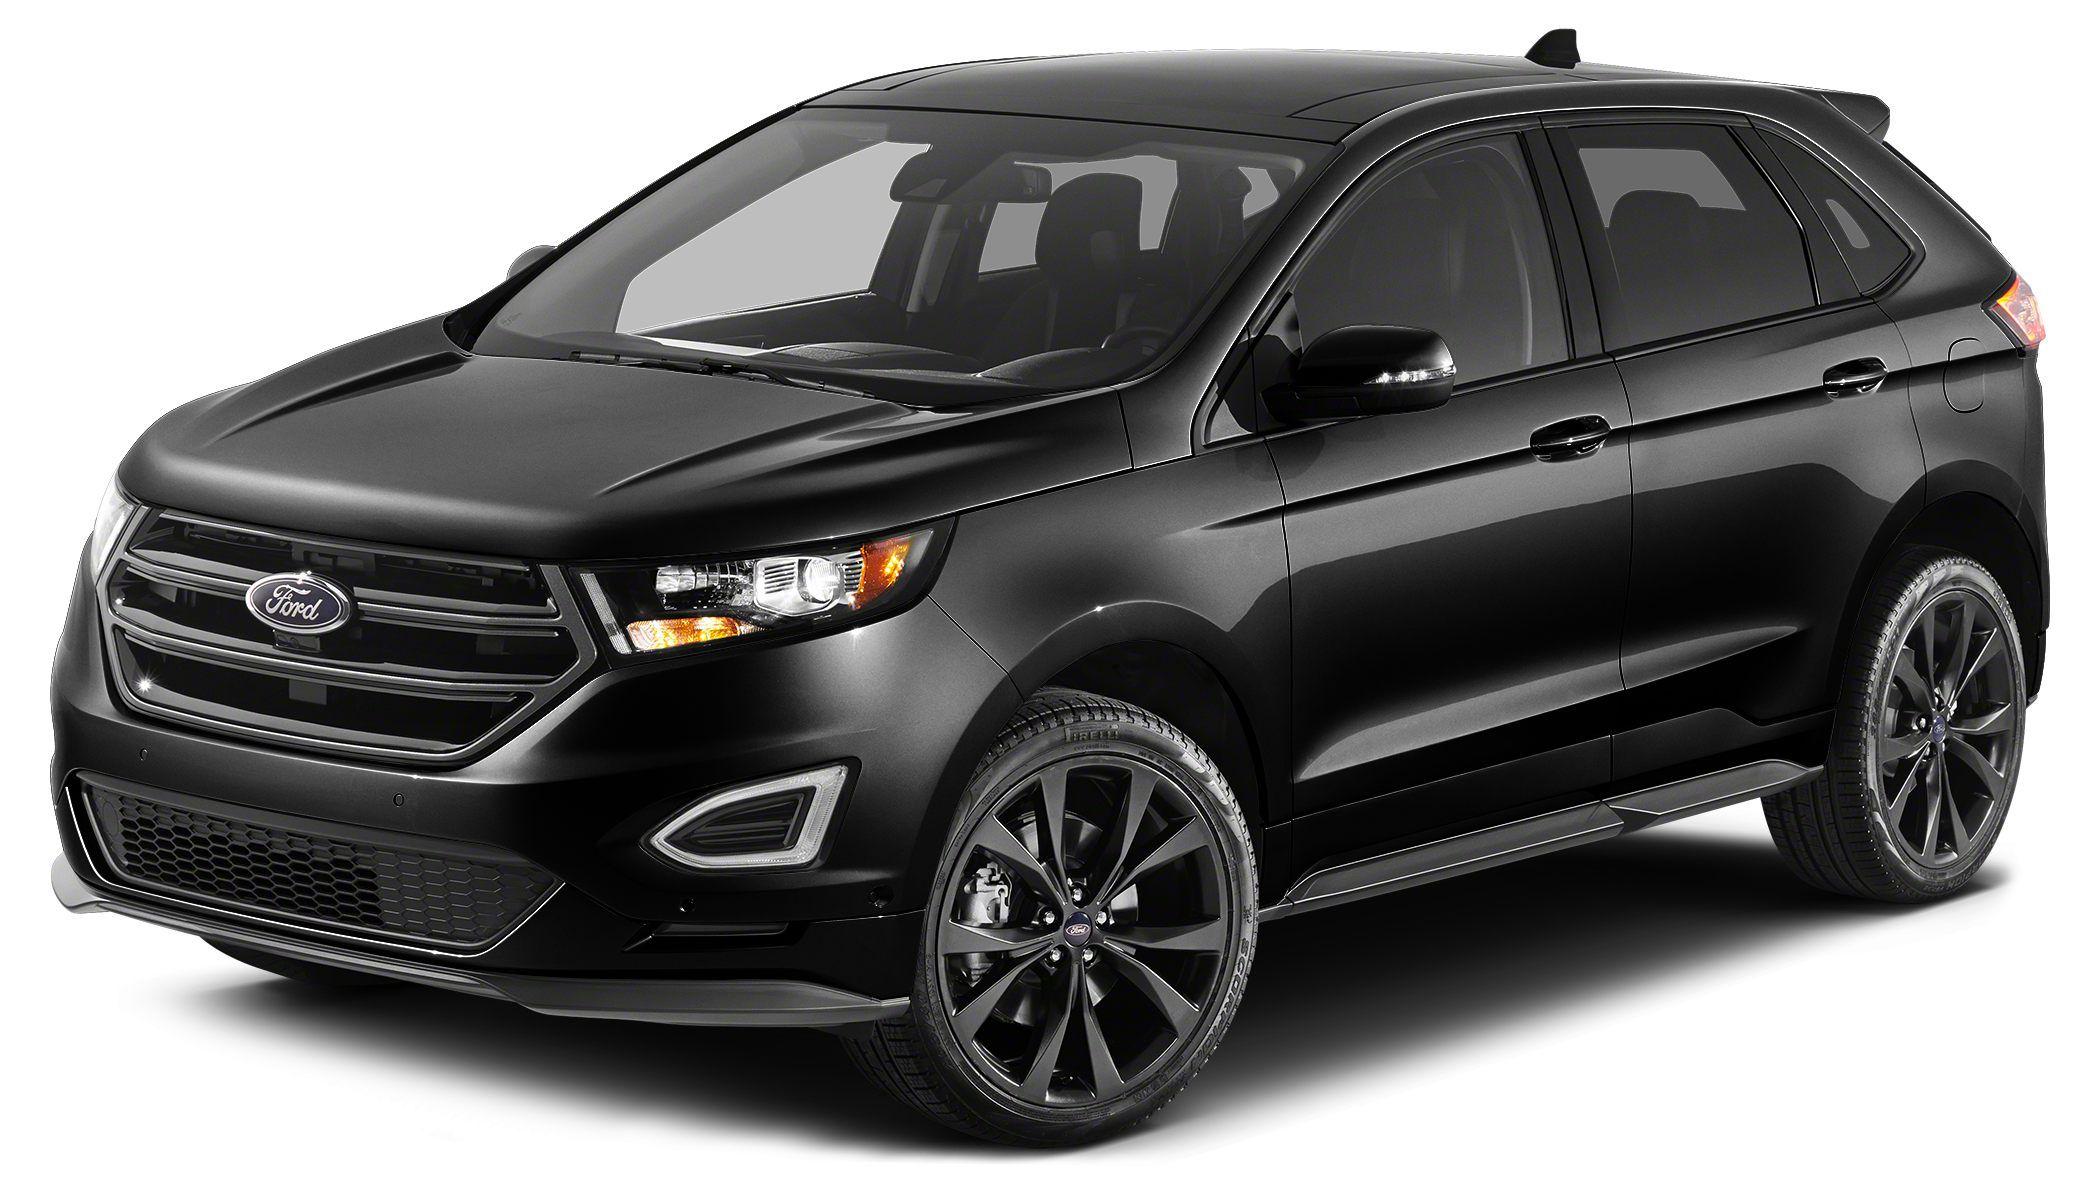 Black 2015 ford edge